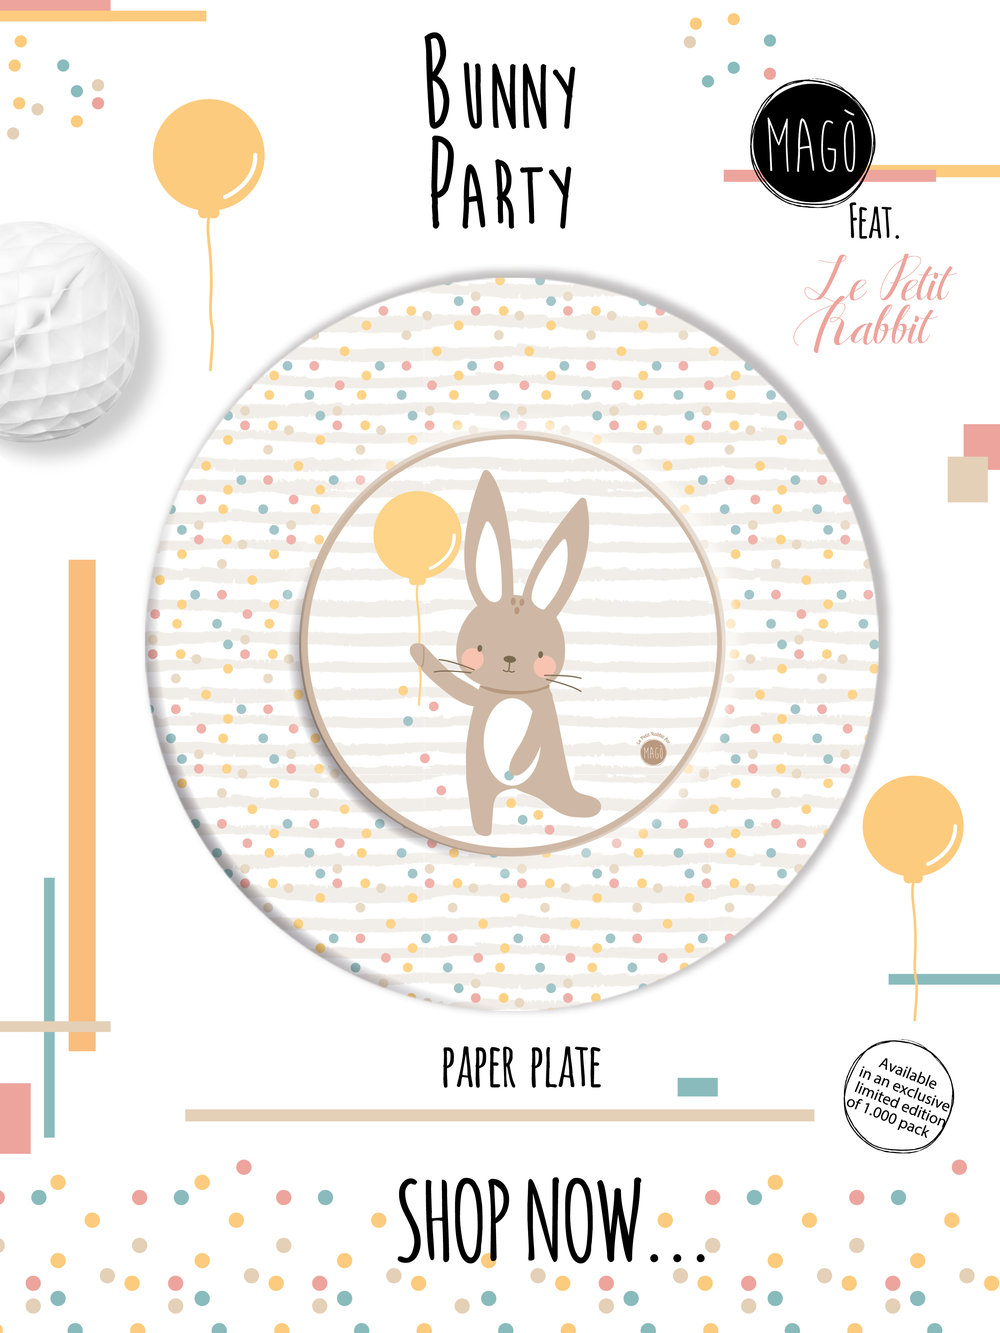 Magò-Party-Festa-Bunny-Party.jpg